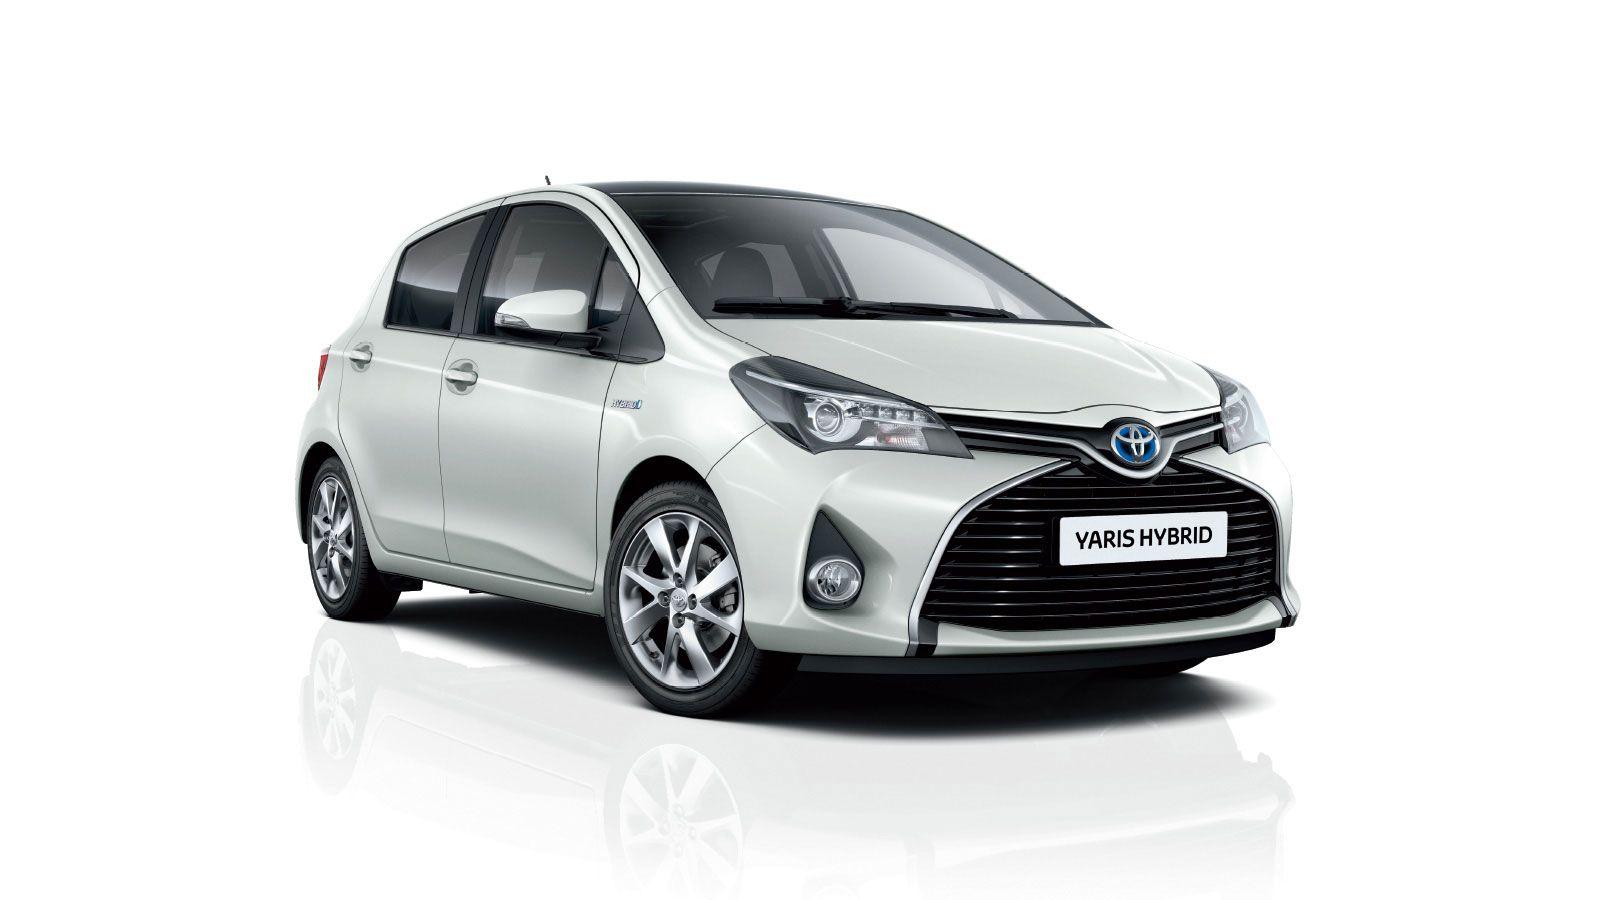 Yaris Hybrid Diesel Cars Toyota Uk Luxury Hybrid Cars